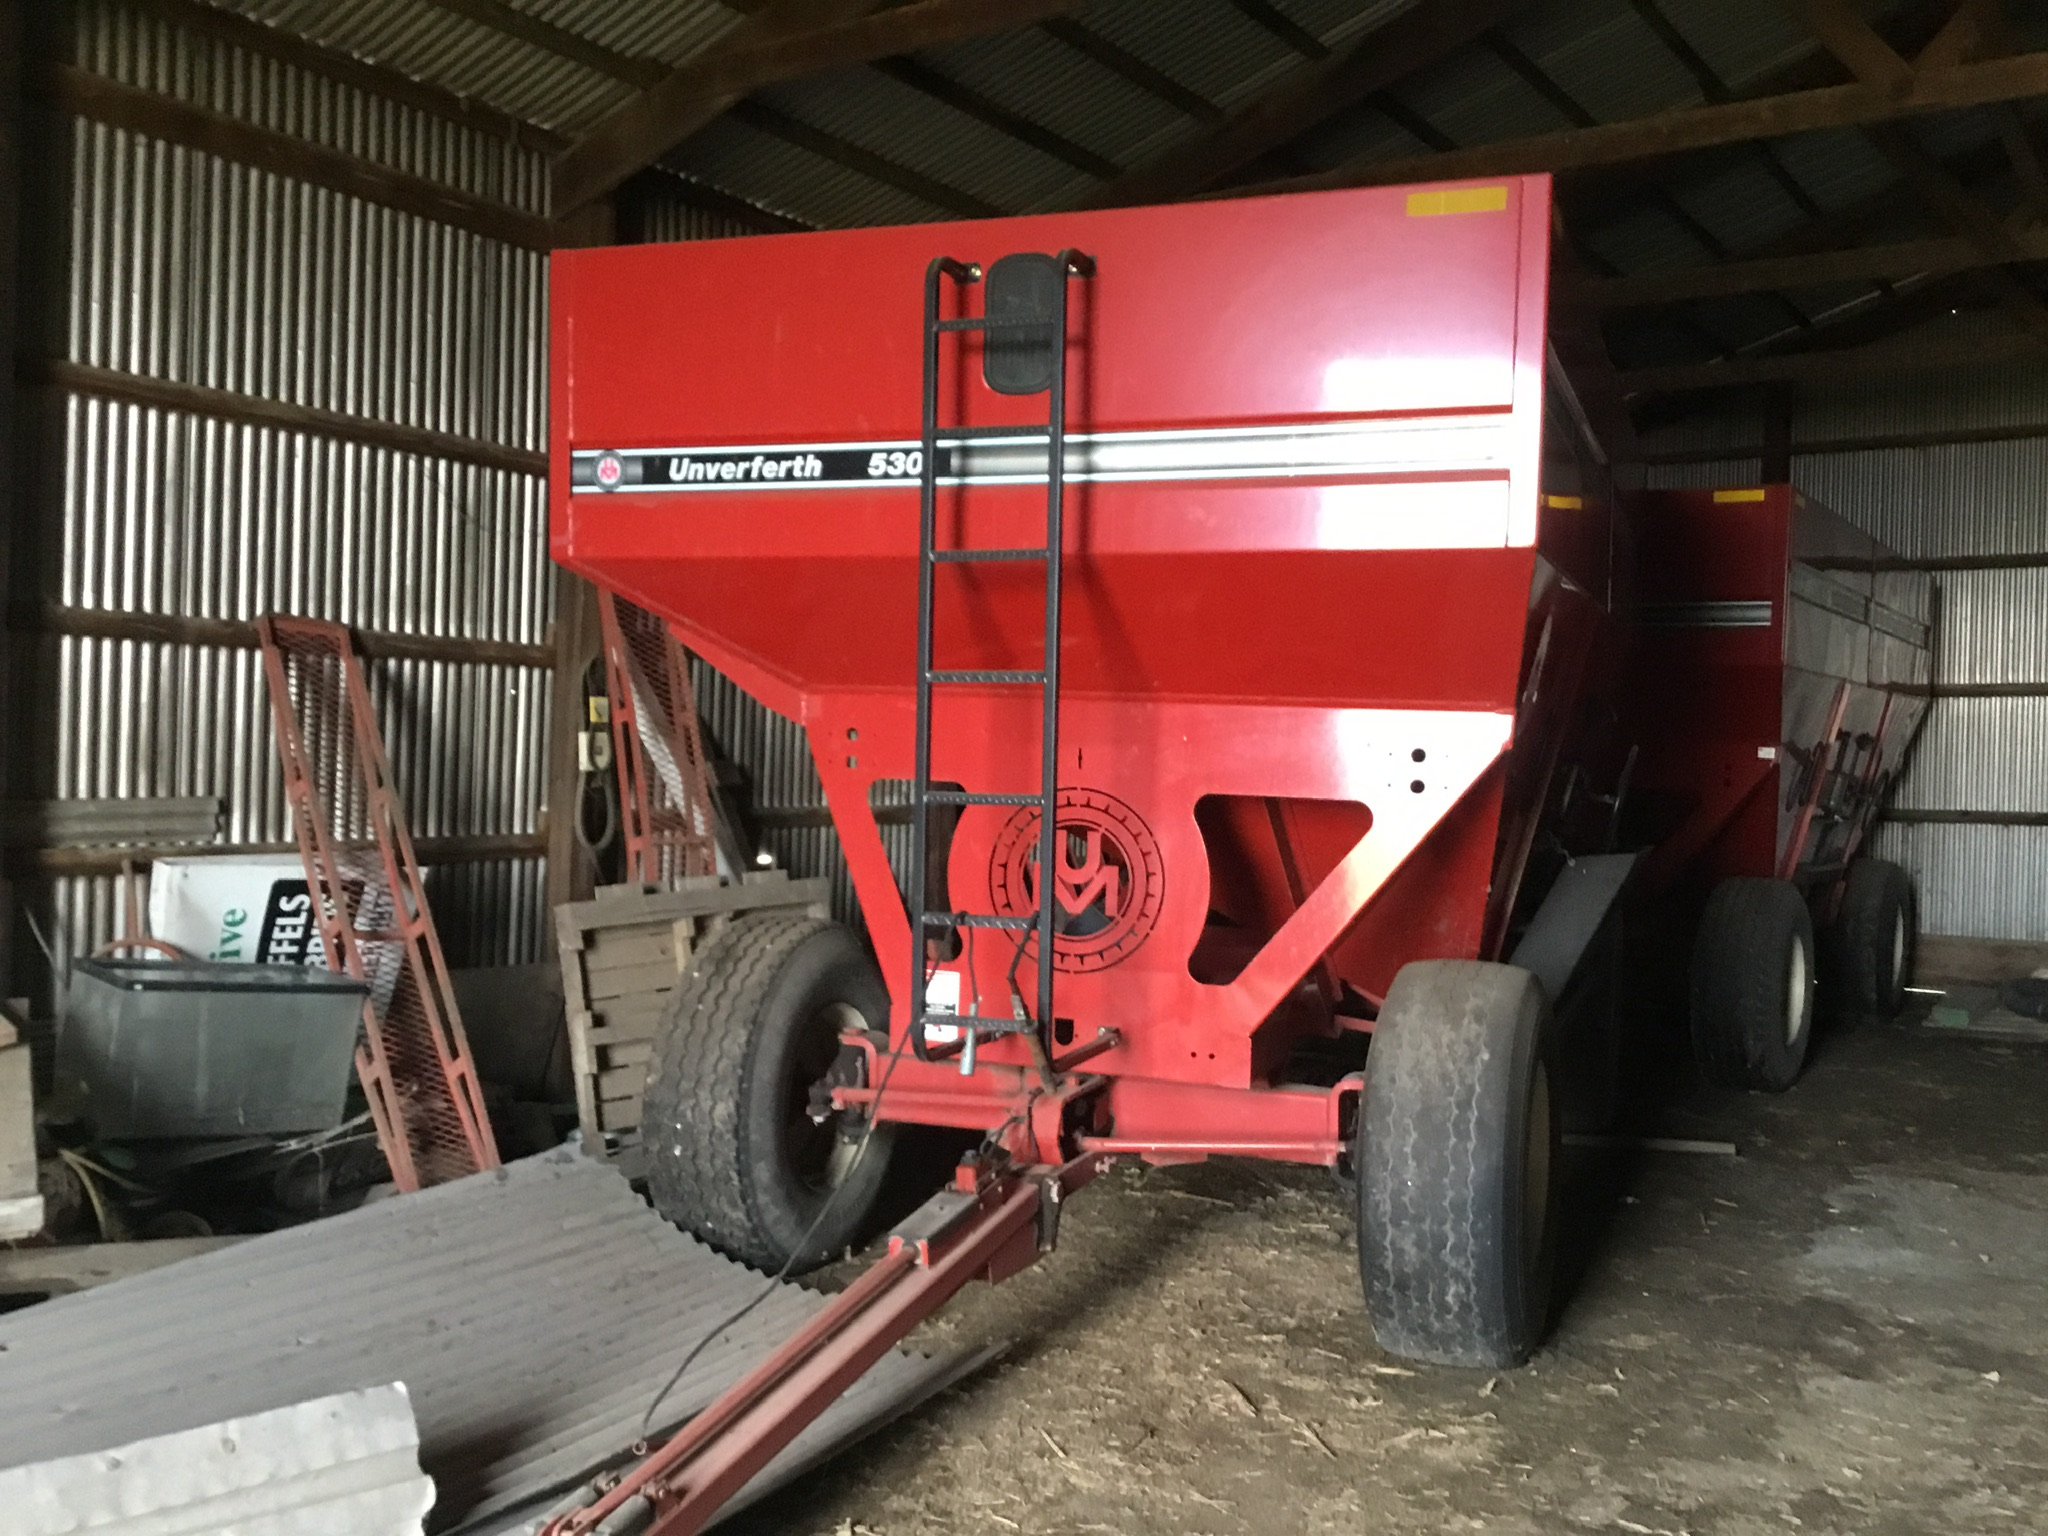 Unverferth 530 Side Dump Wagon, Brakes, 425-65R-22.5 Tires, Serial #B206-50-116, Red, Sharp